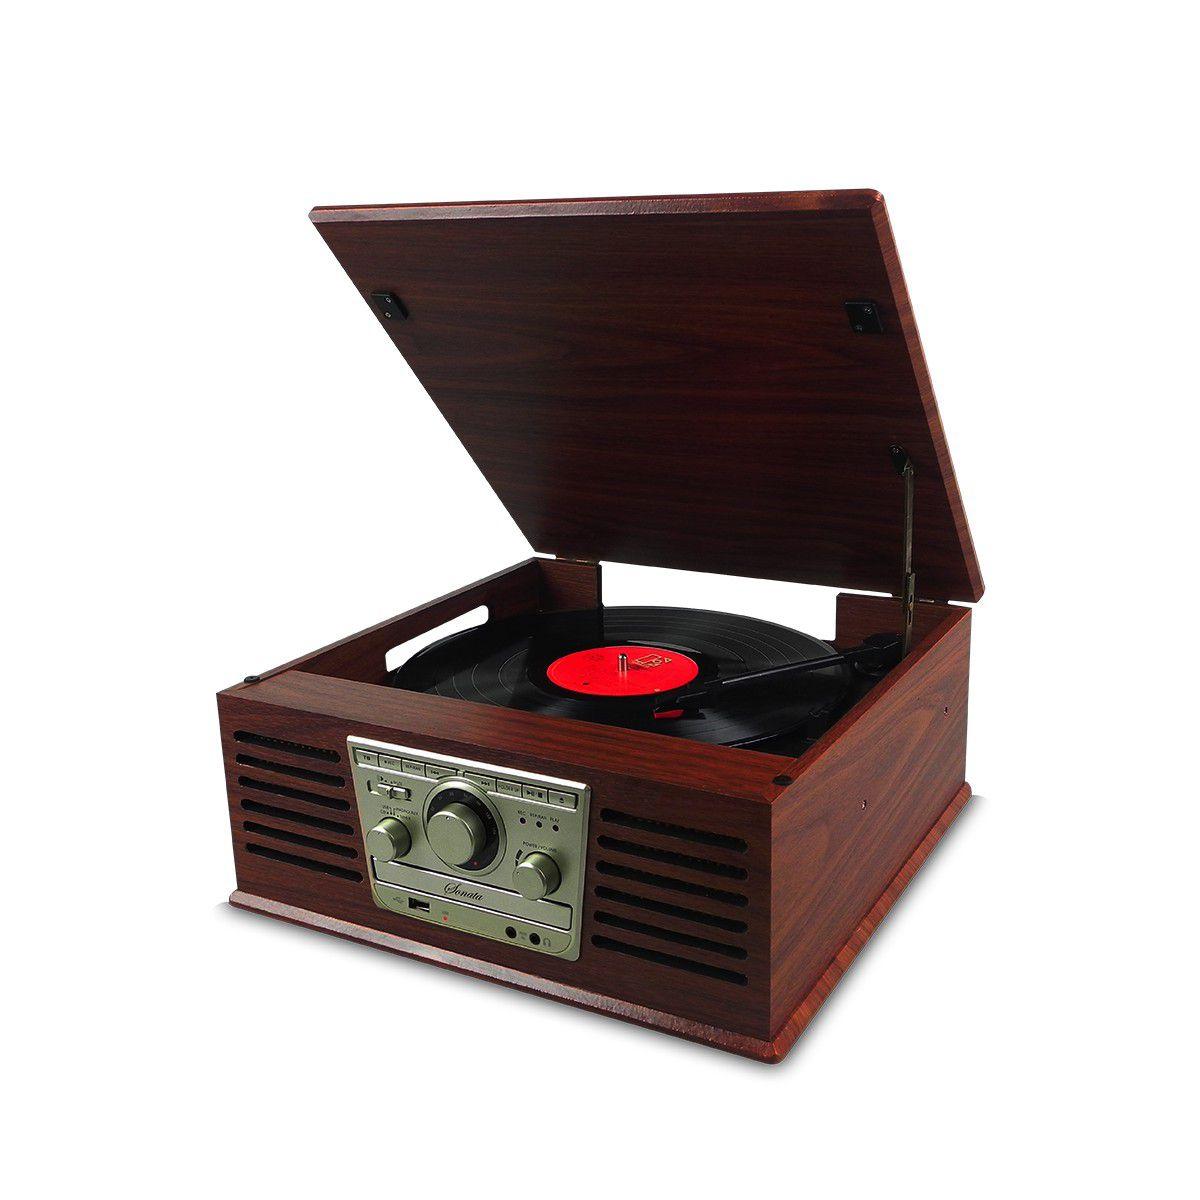 Vitrola Raveo Sonata BT - Toca-Discos, CD Player, Bluetooth, Radio FM